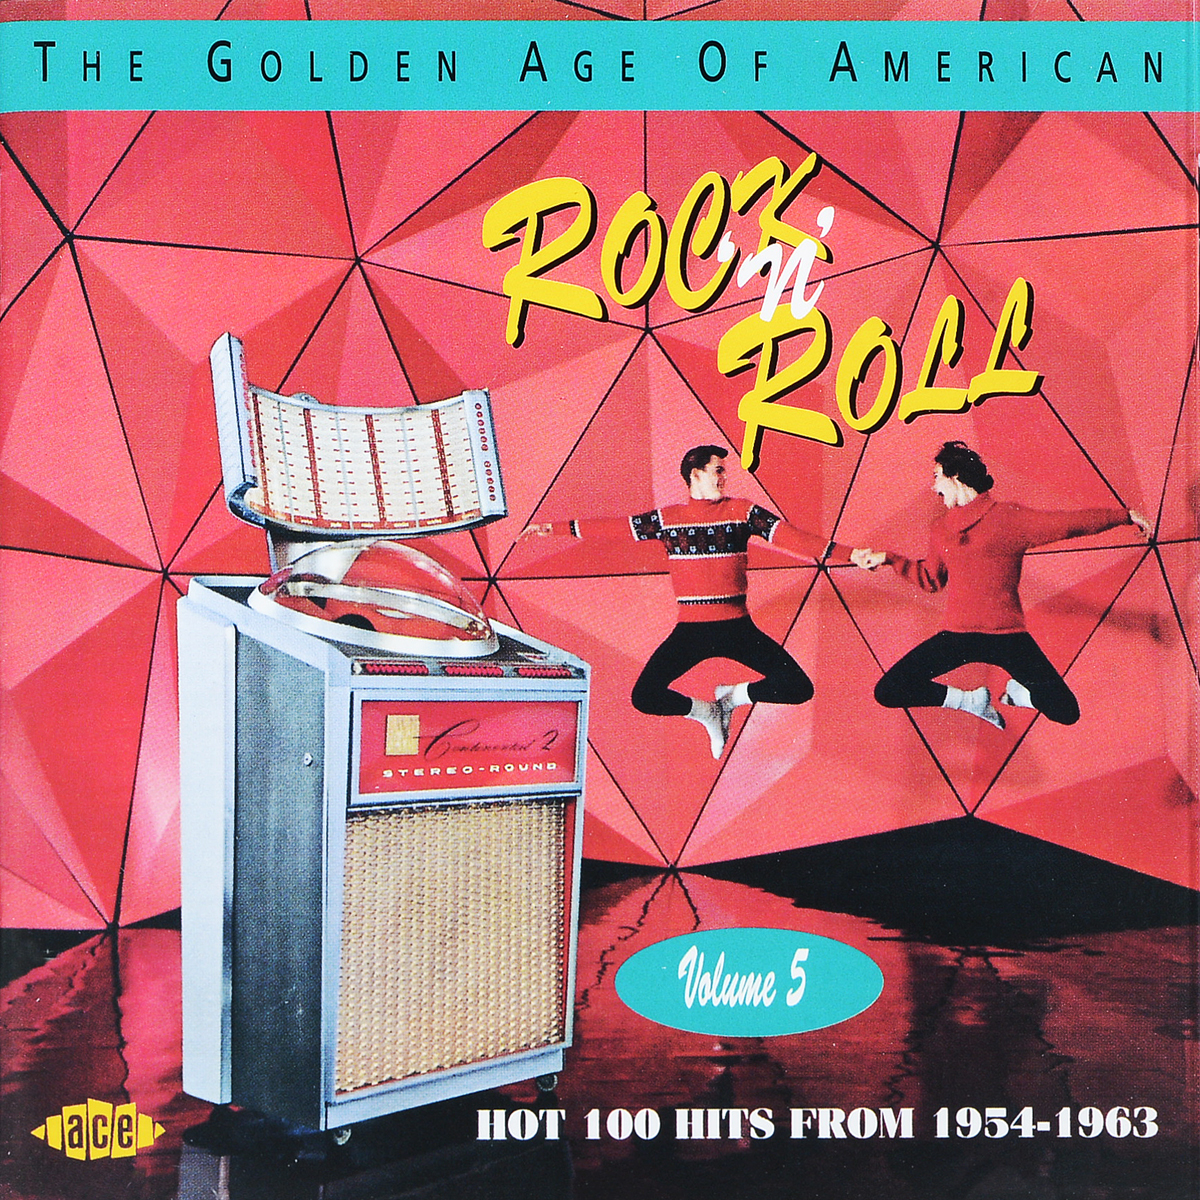 цены на The Golden Age Of American Rock 'n' Roll Volume 5  в интернет-магазинах